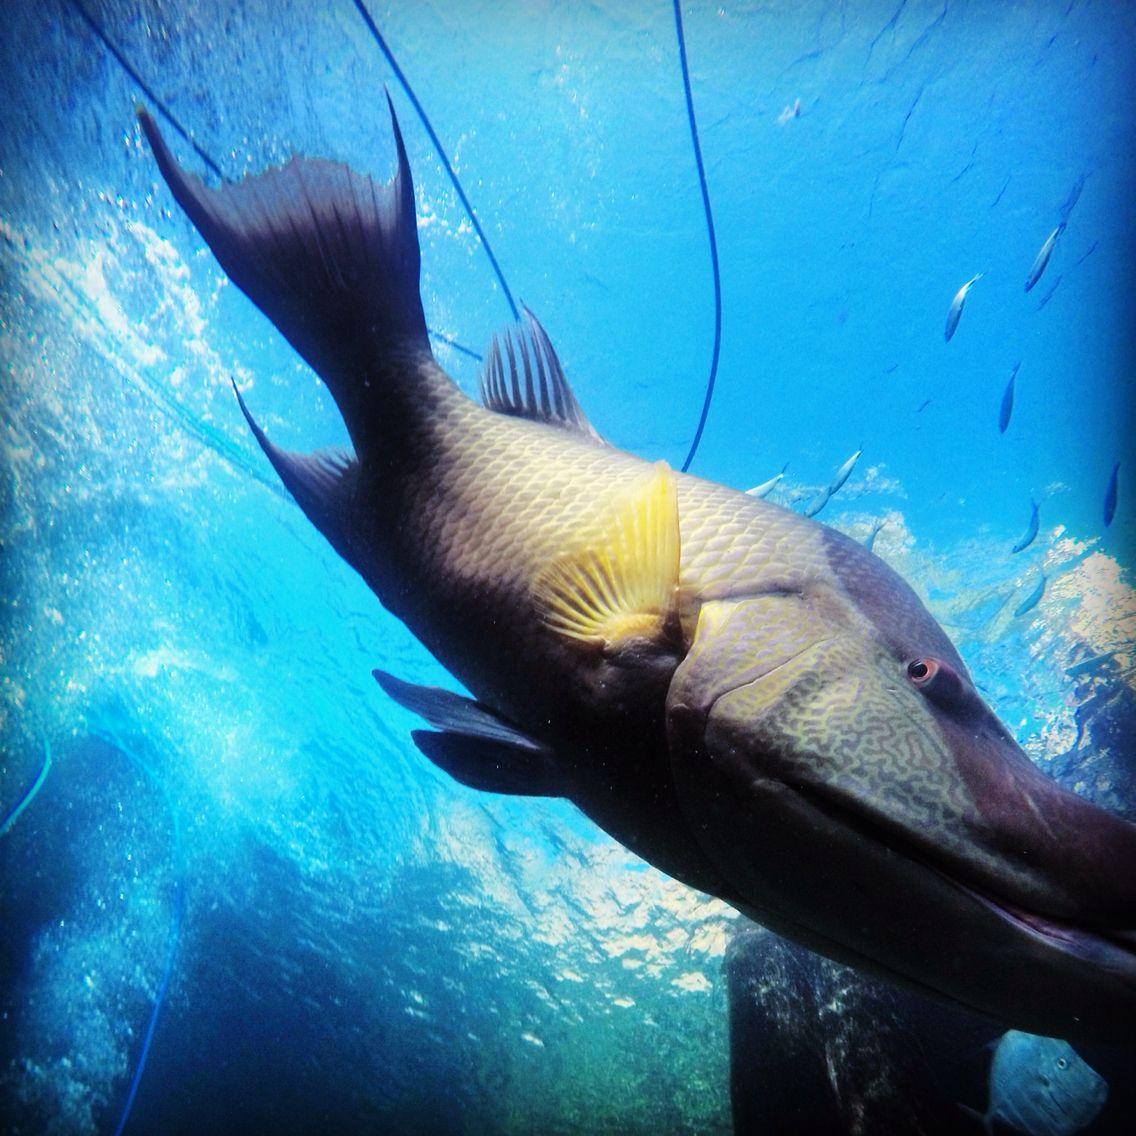 Bob Fish Underwater Photography Underwater Photography Fish Pet Animals